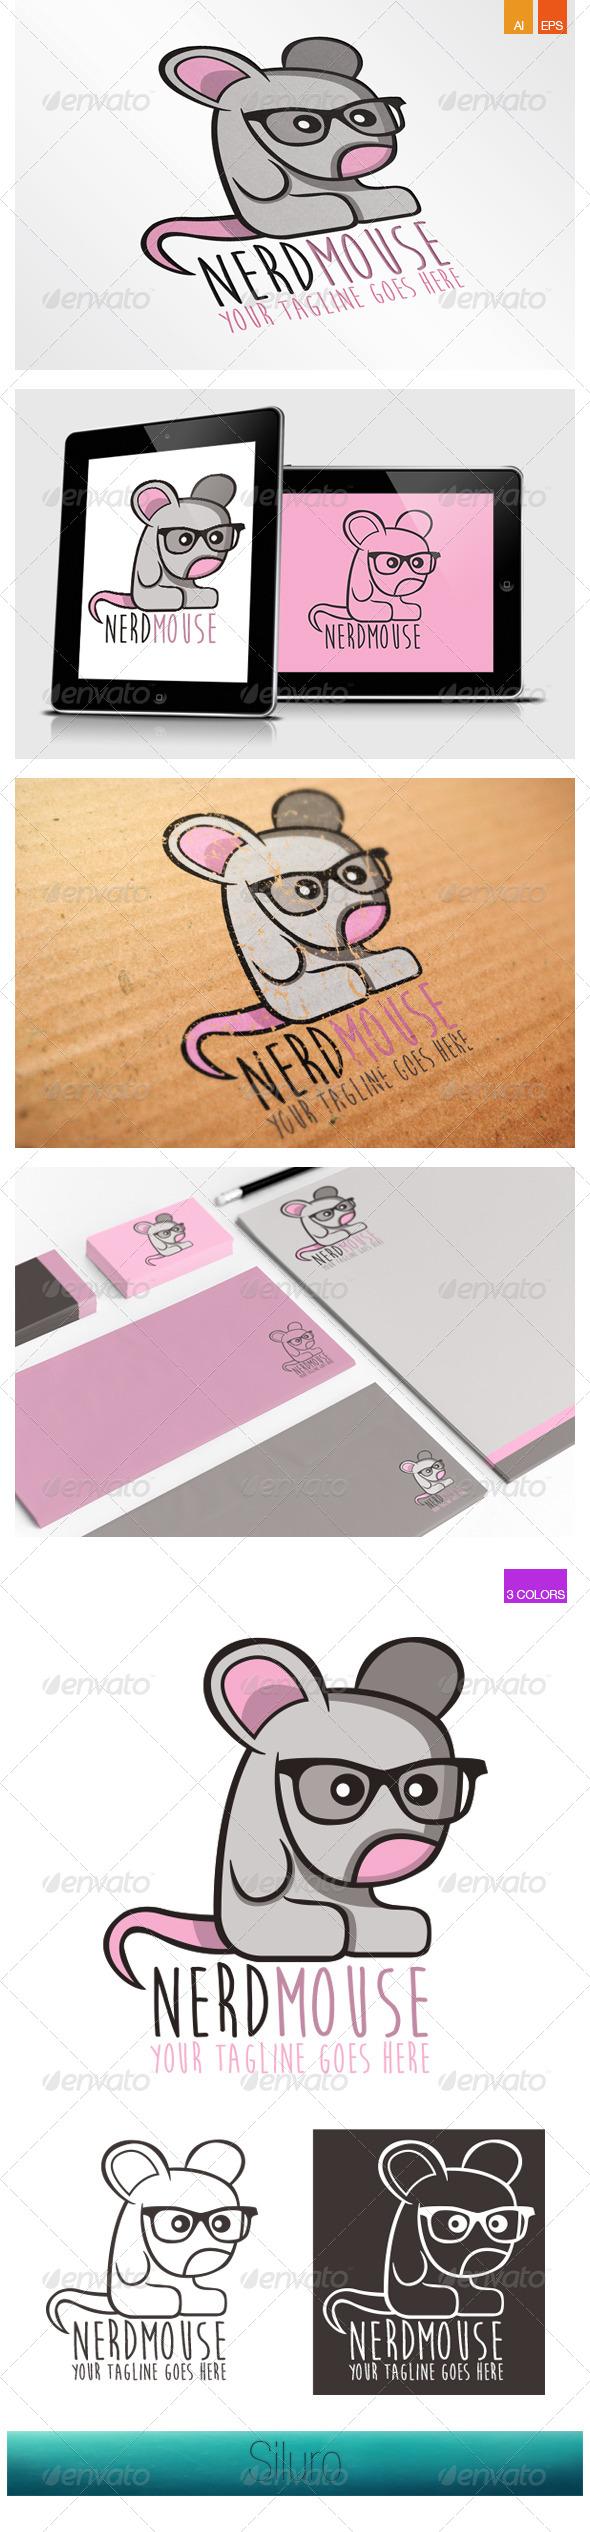 GraphicRiver Nerd Mouse Logo 8512909